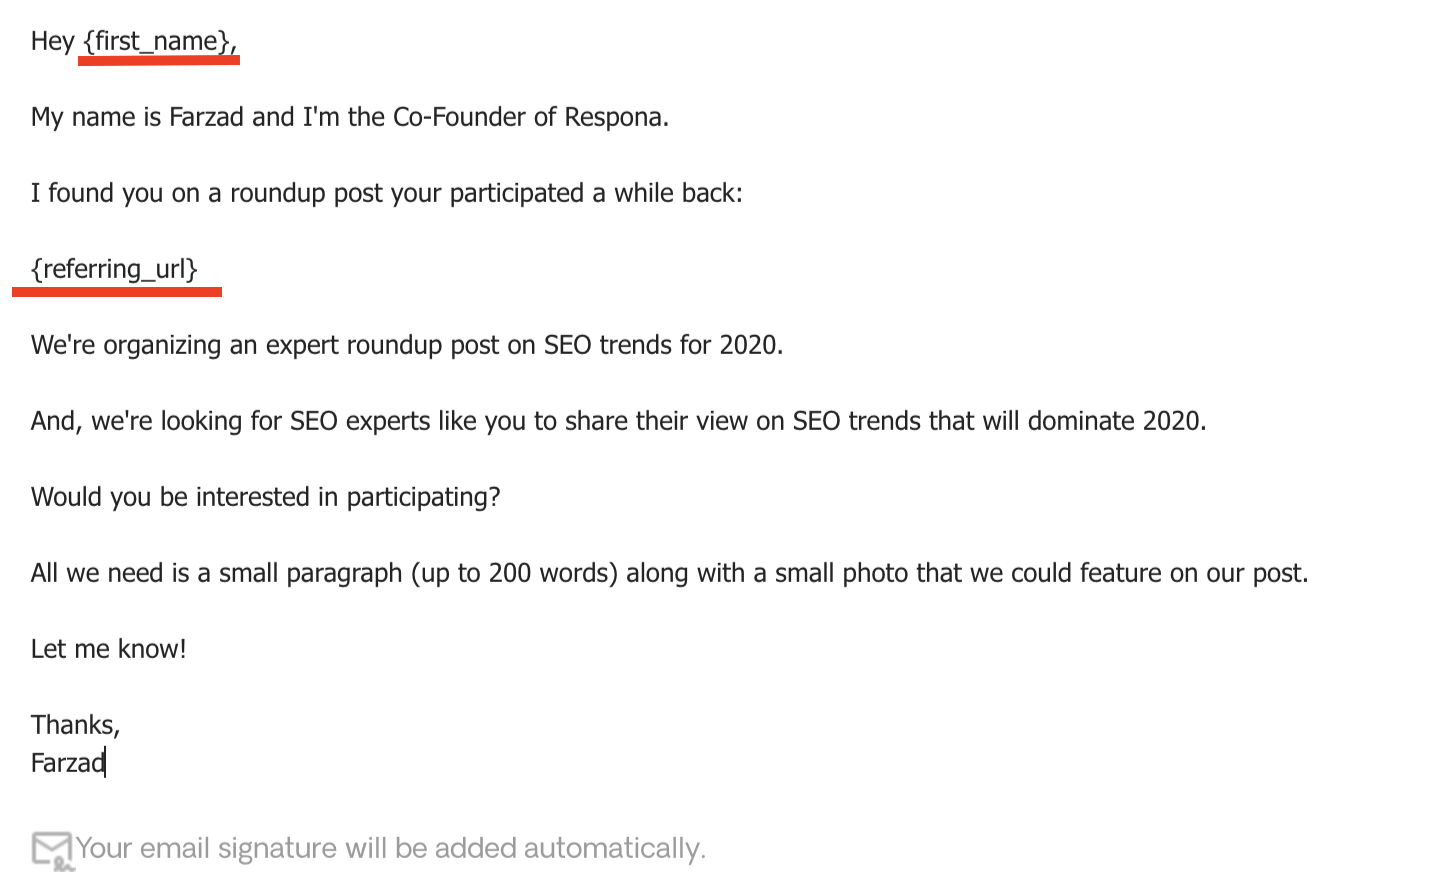 Custom Fields in Email